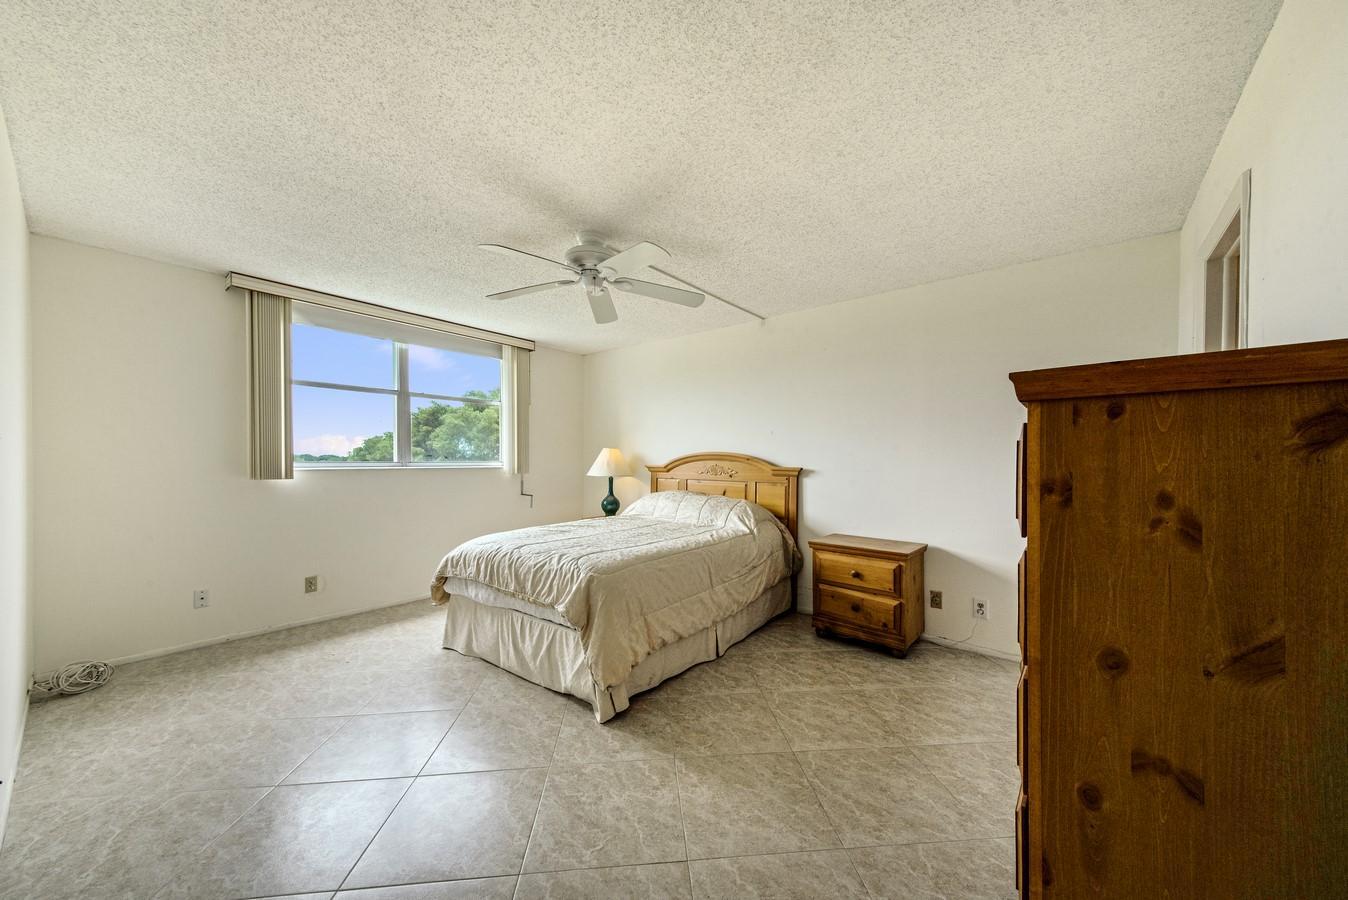 6161 NW 2nd Avenue 422 Boca Raton, FL 33487 photo 10